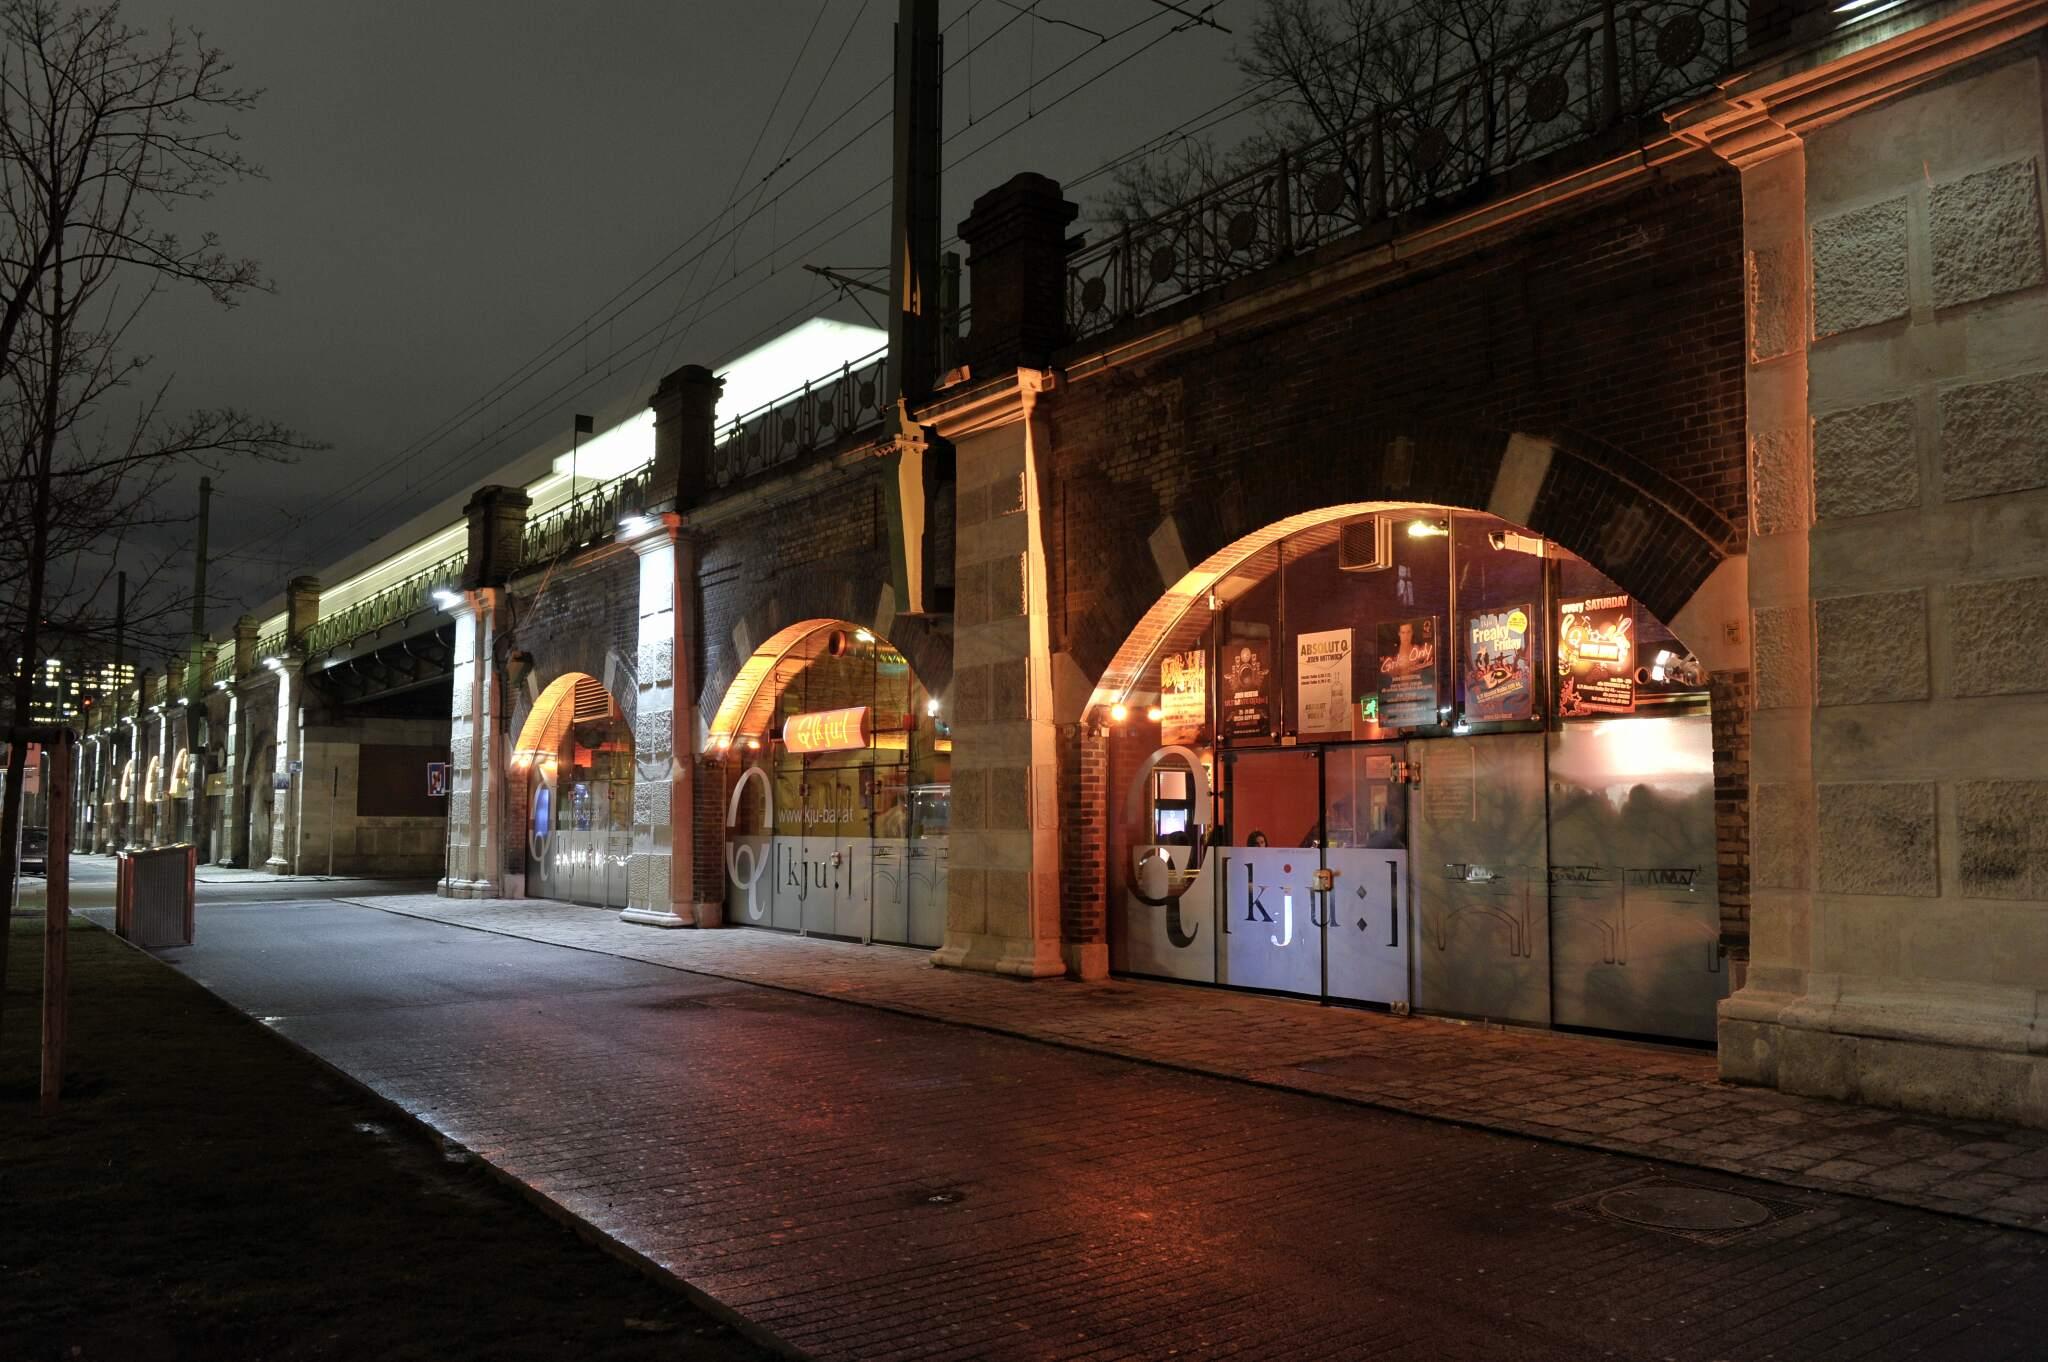 Stadtbahnbögen am Gürtel - Lokal bei Nacht